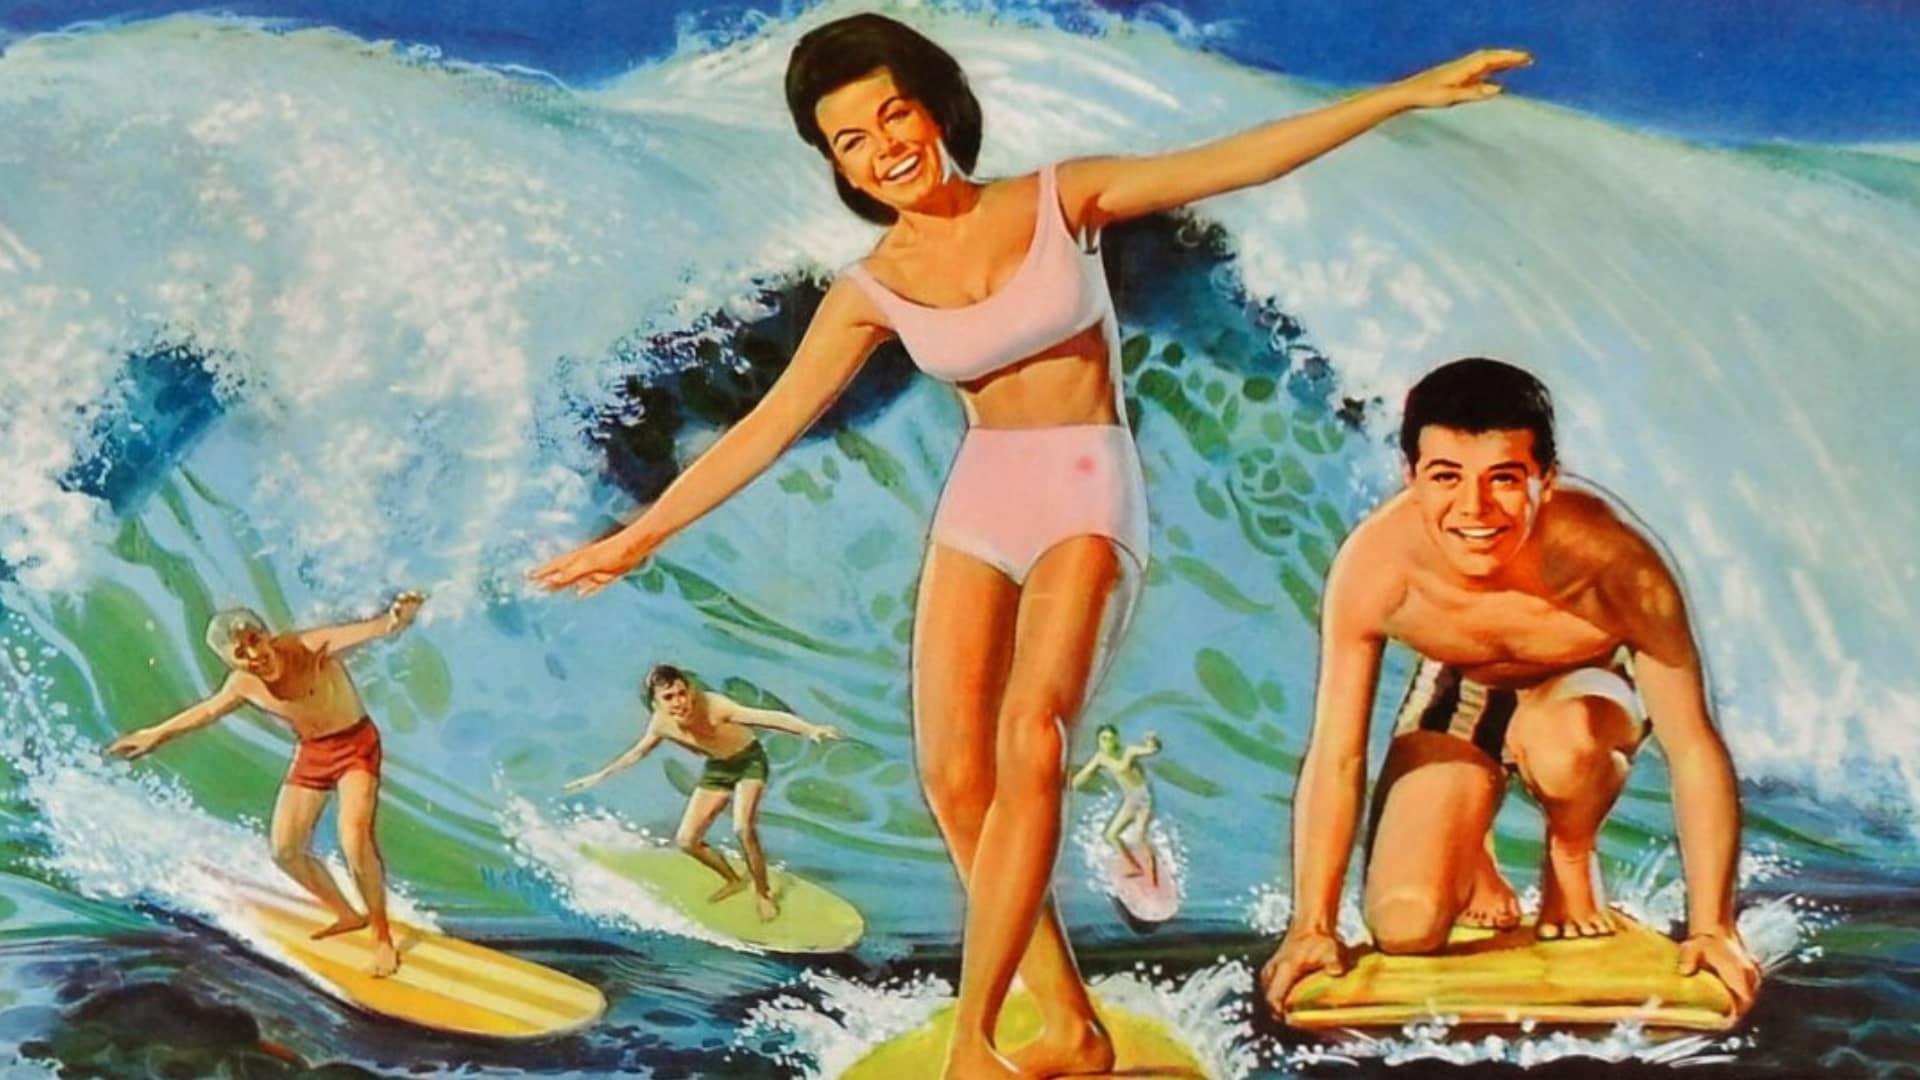 Video Essay: The Beach Party Genre